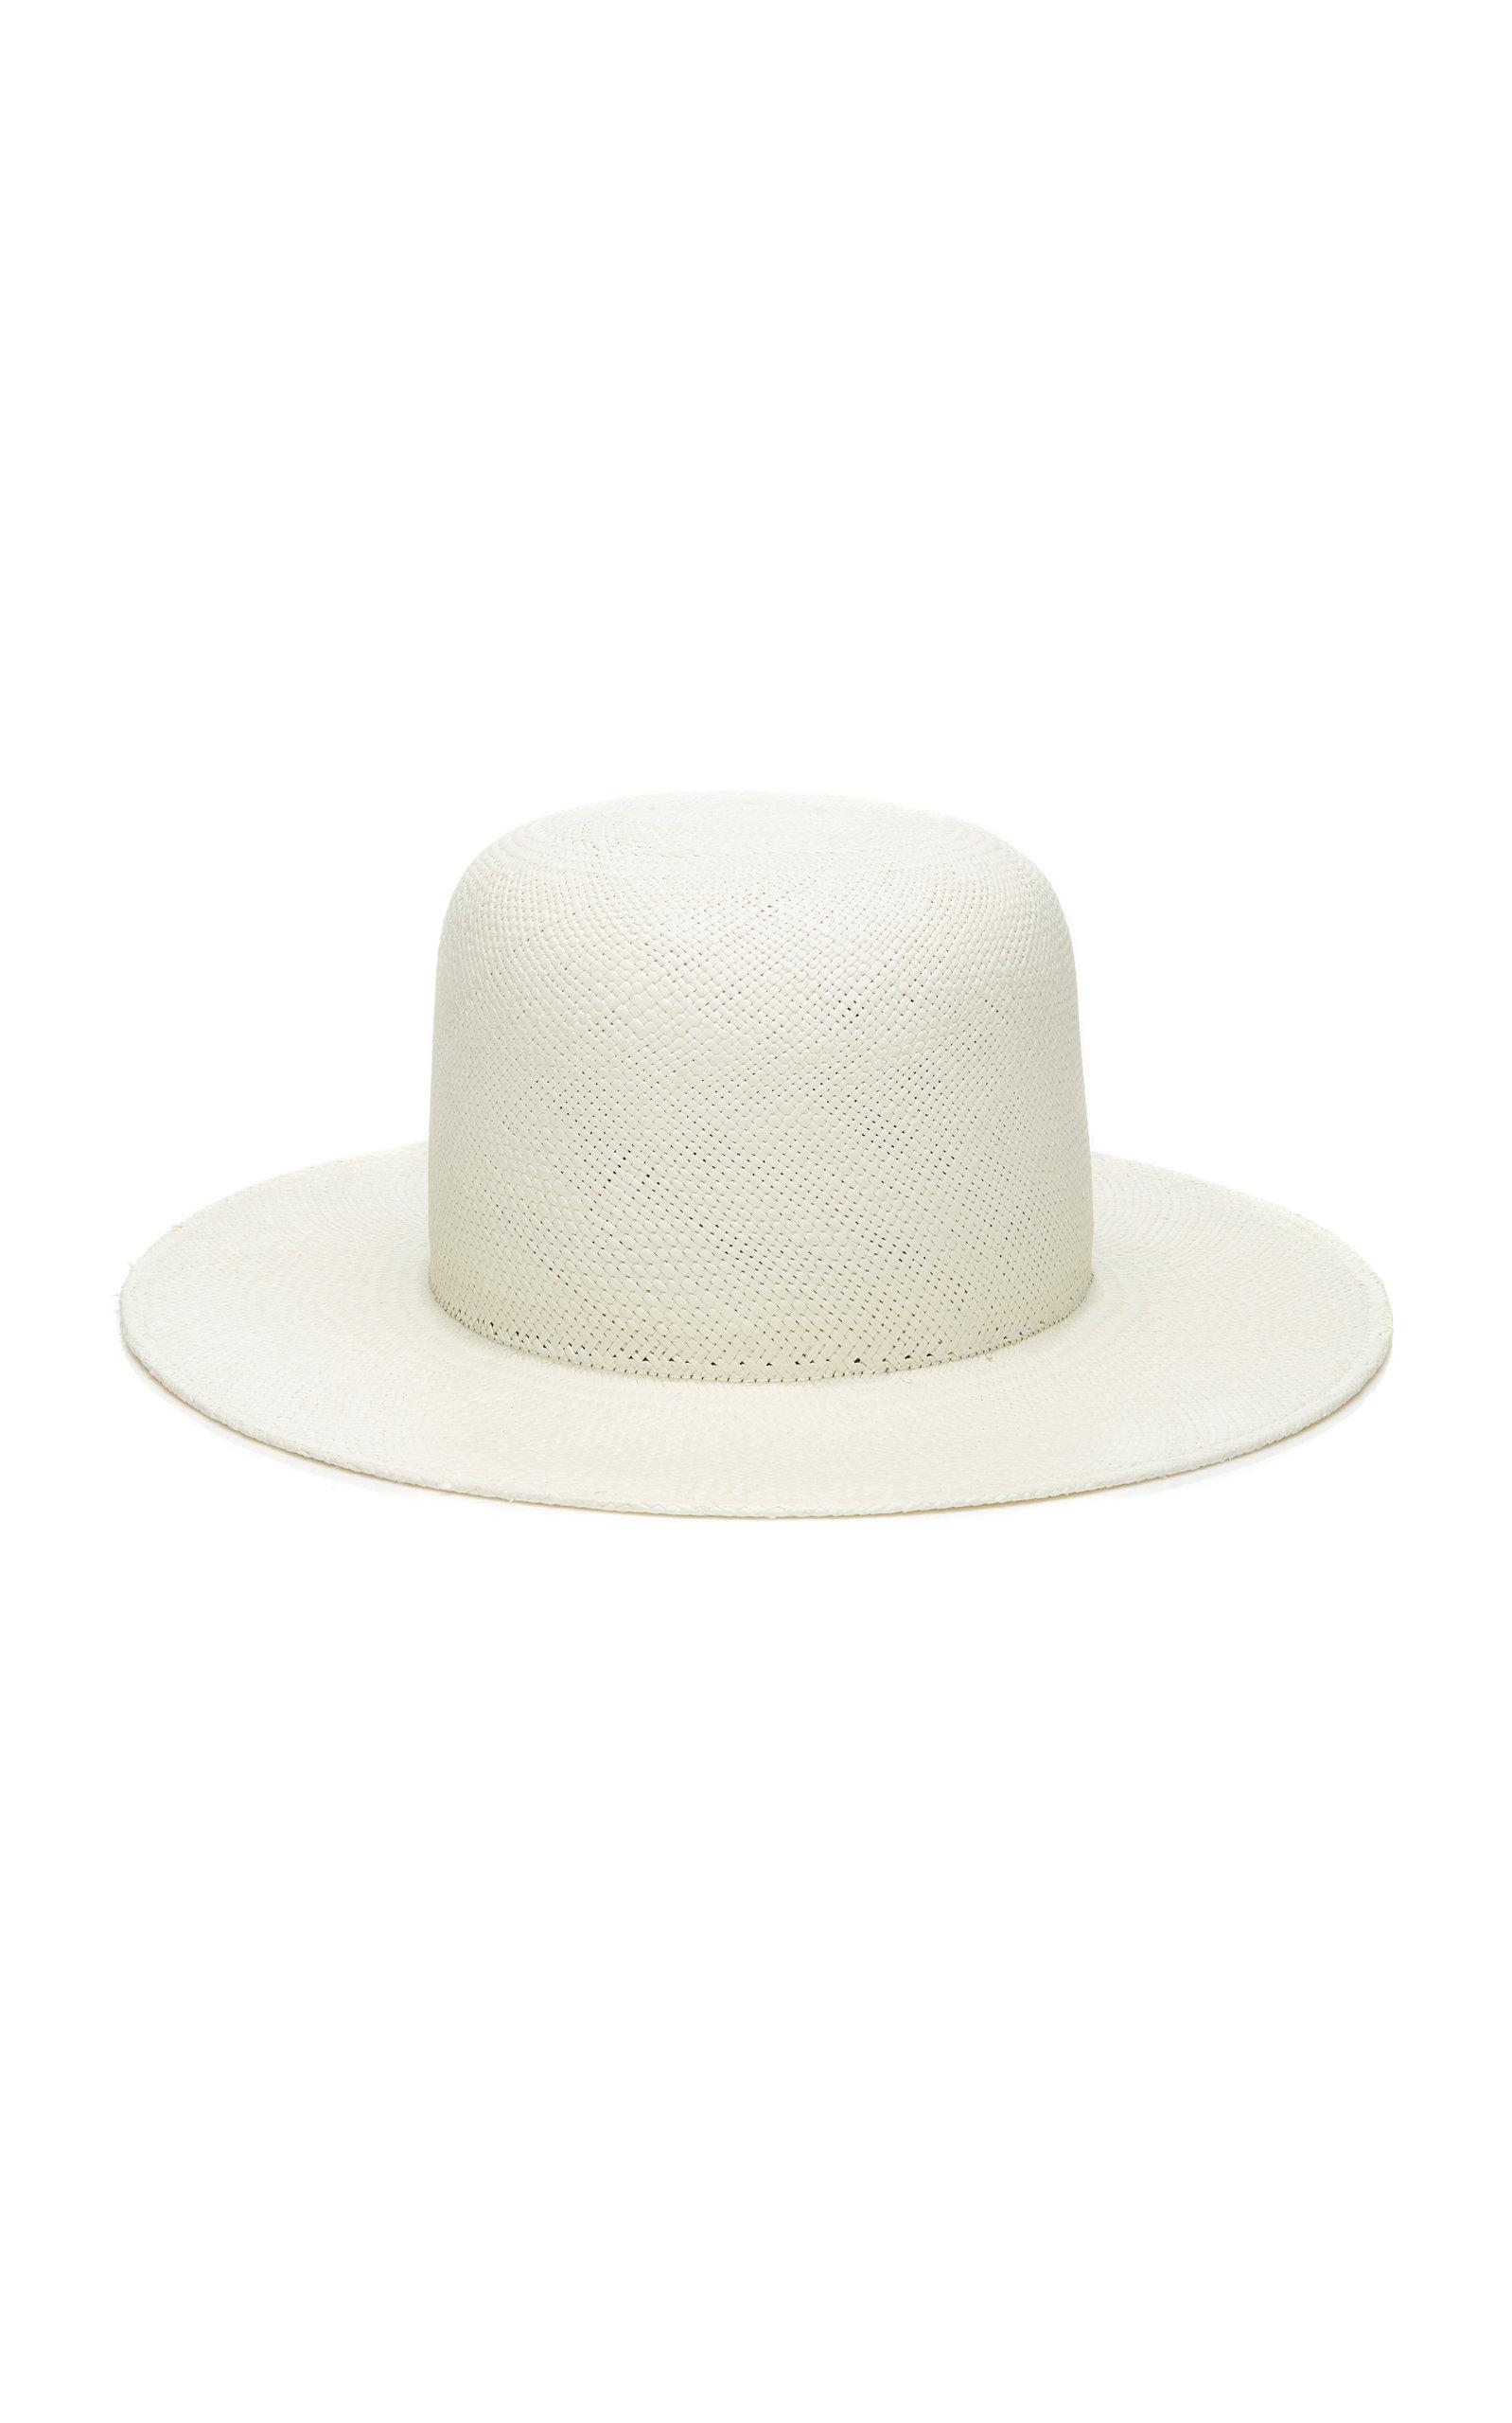 JANESSA LEONE ALICE STRAW HAT